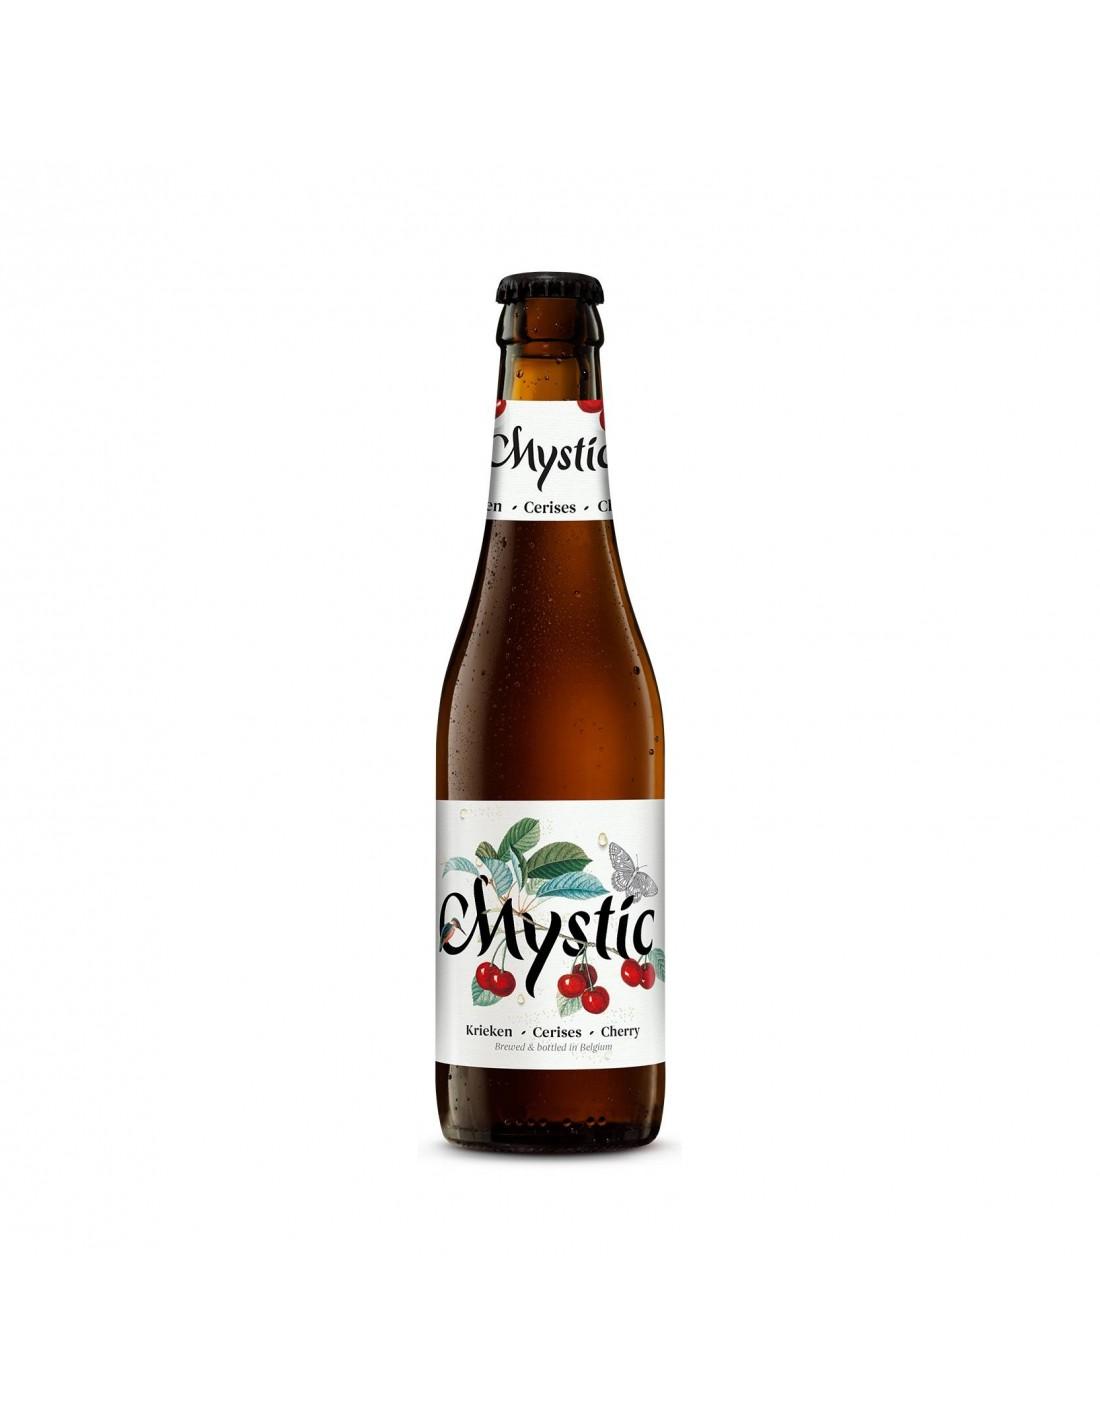 Bere Mystic Cirese, 3.5% alc., 0.25L, Belgia